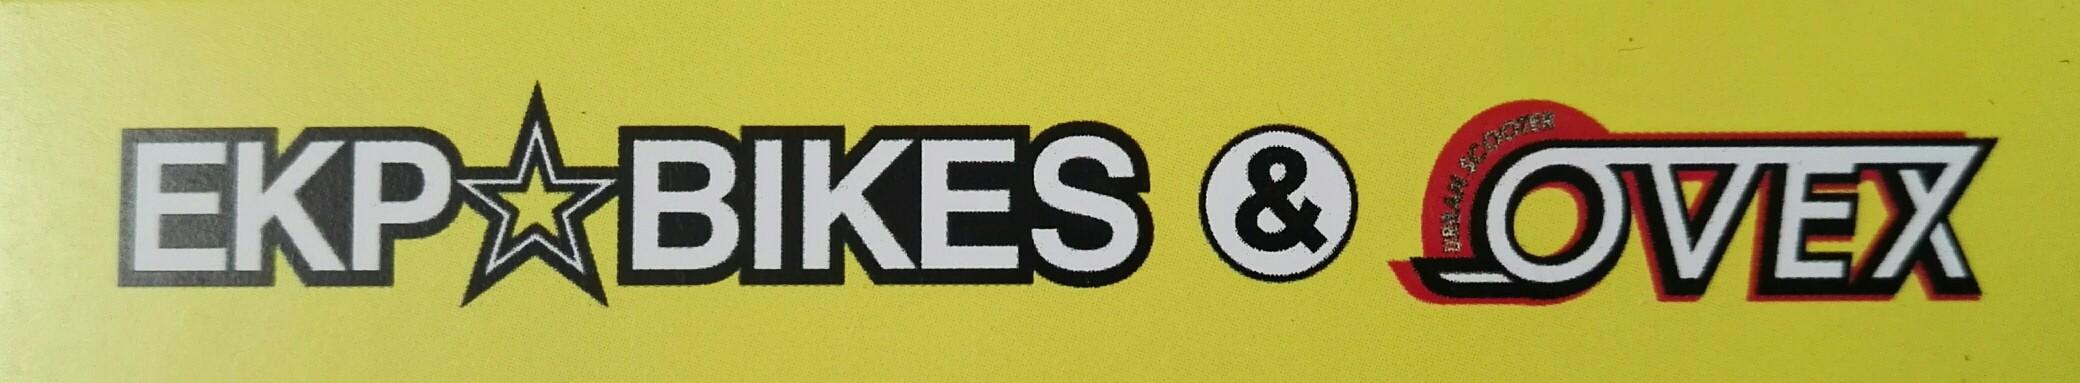 EKP Bikes - logo